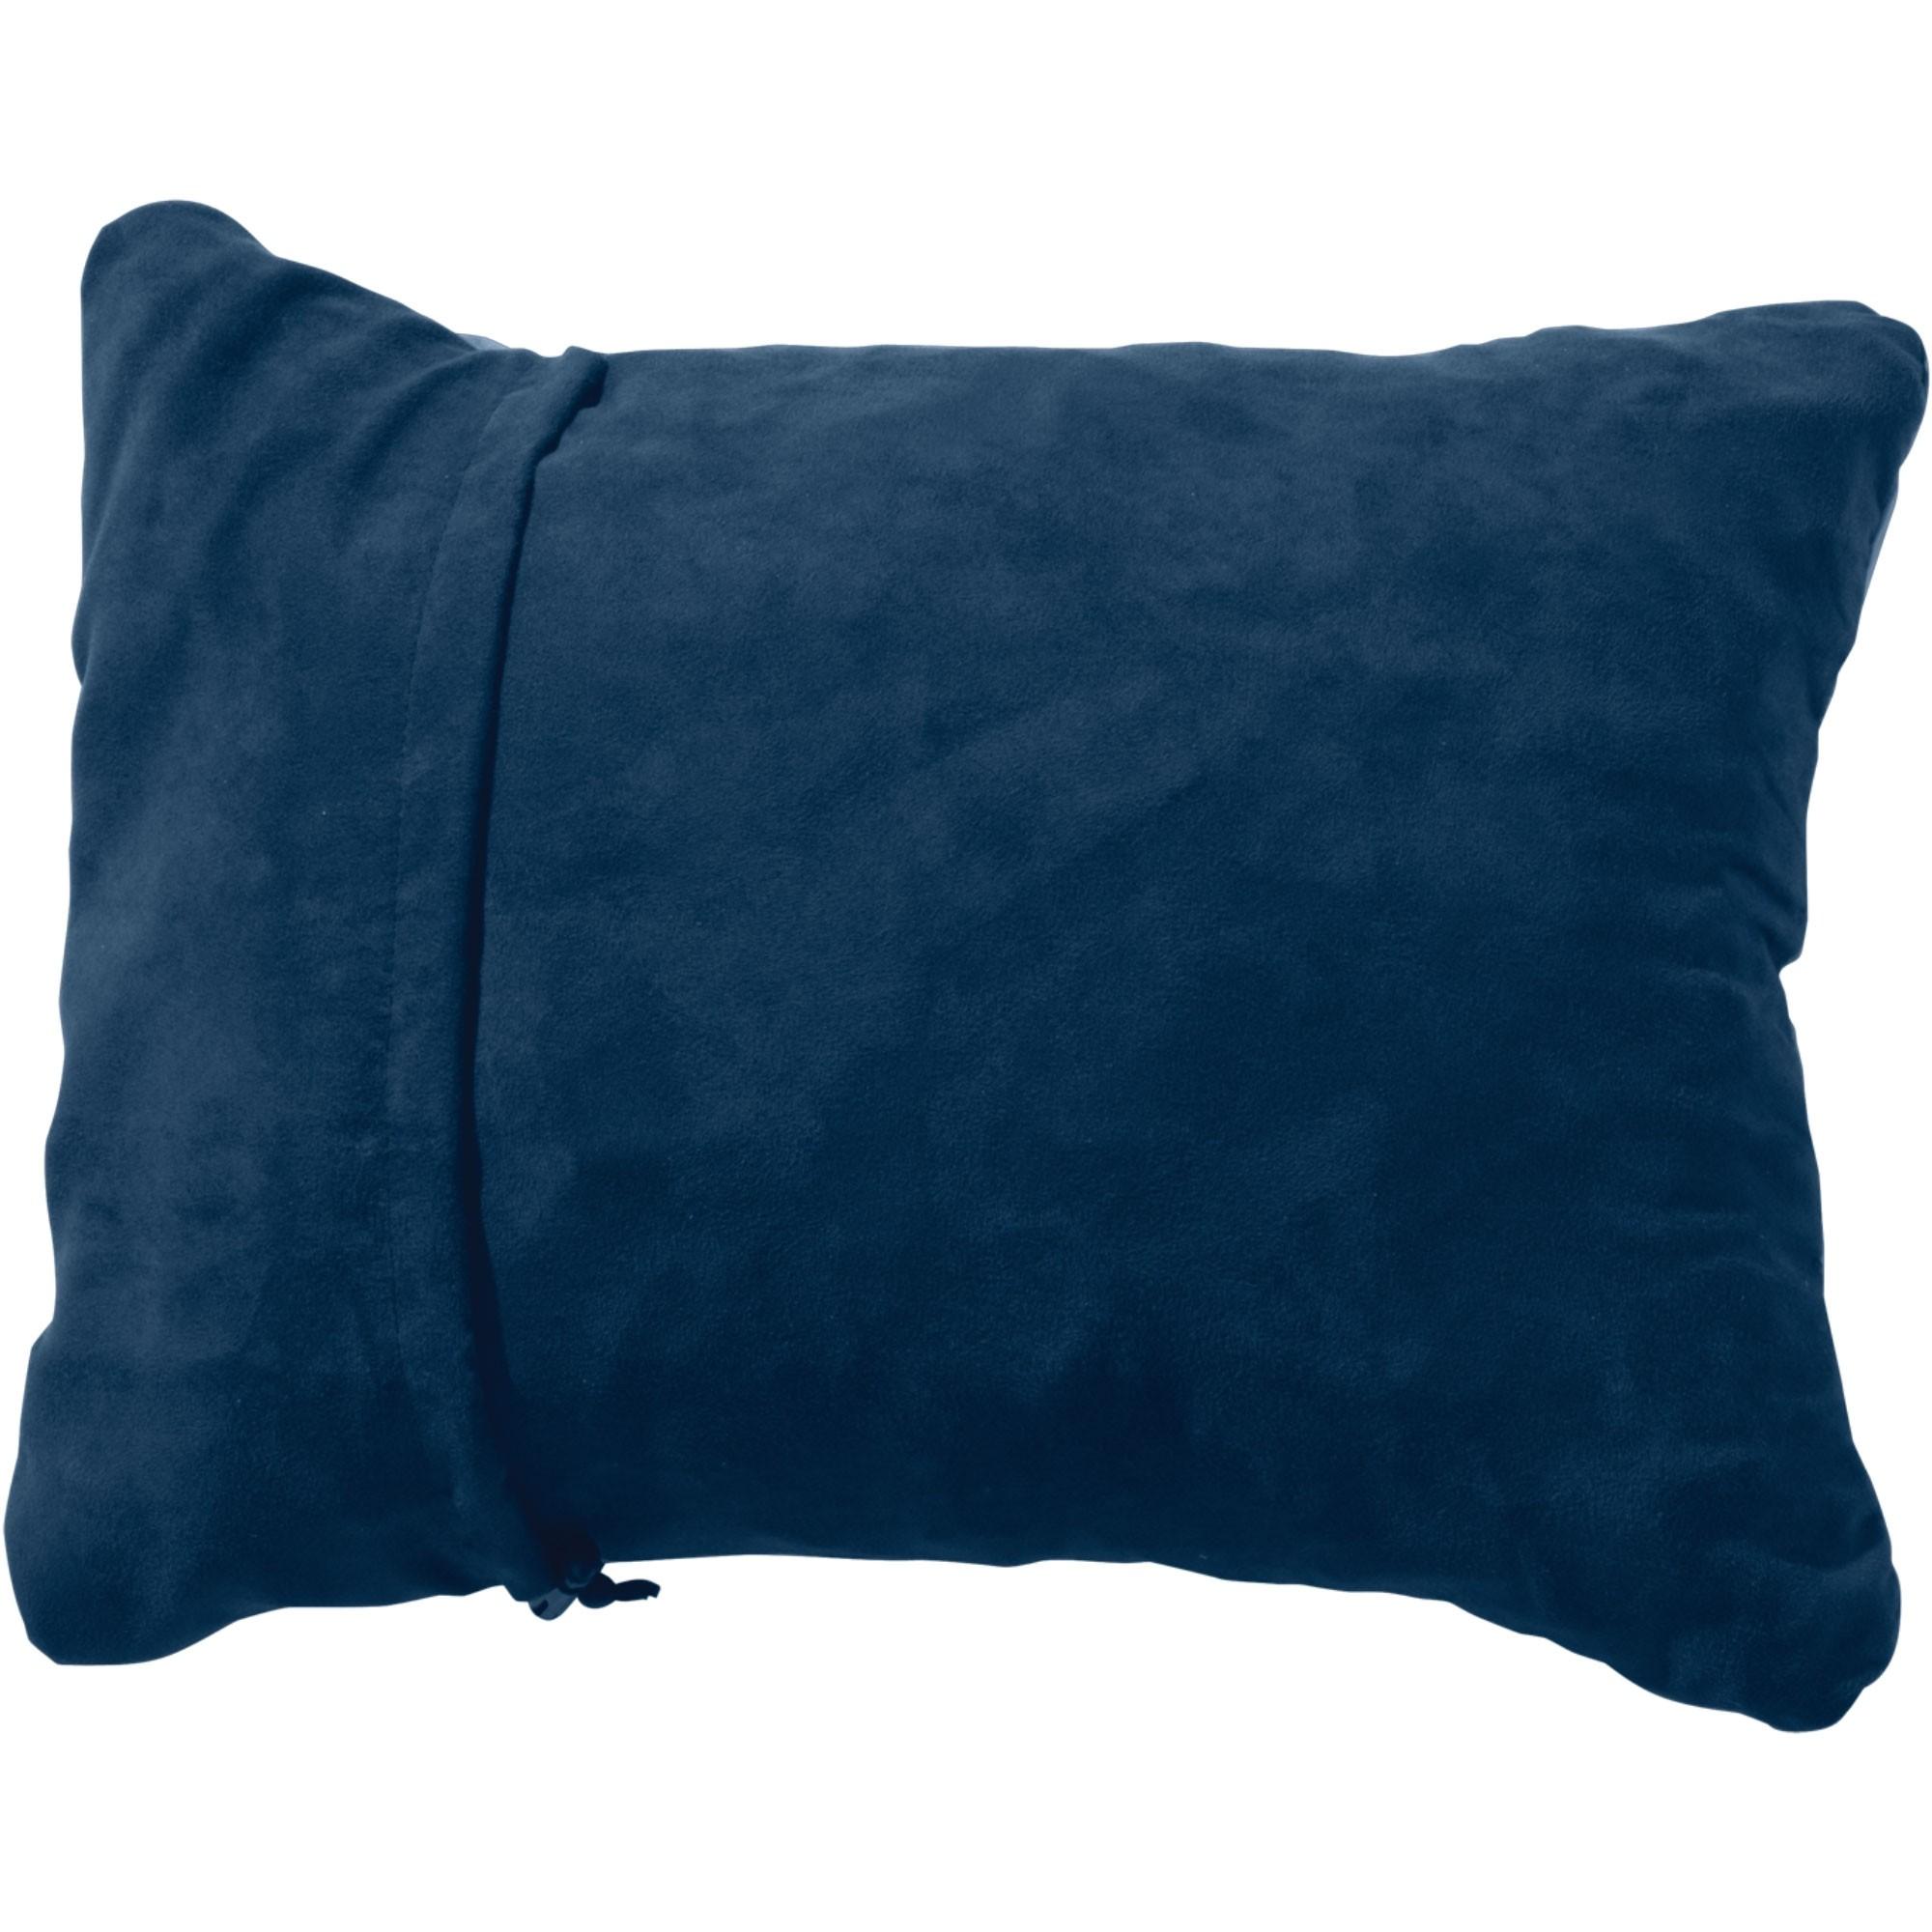 Therm-a-Rest Compressible Pillow - Denim